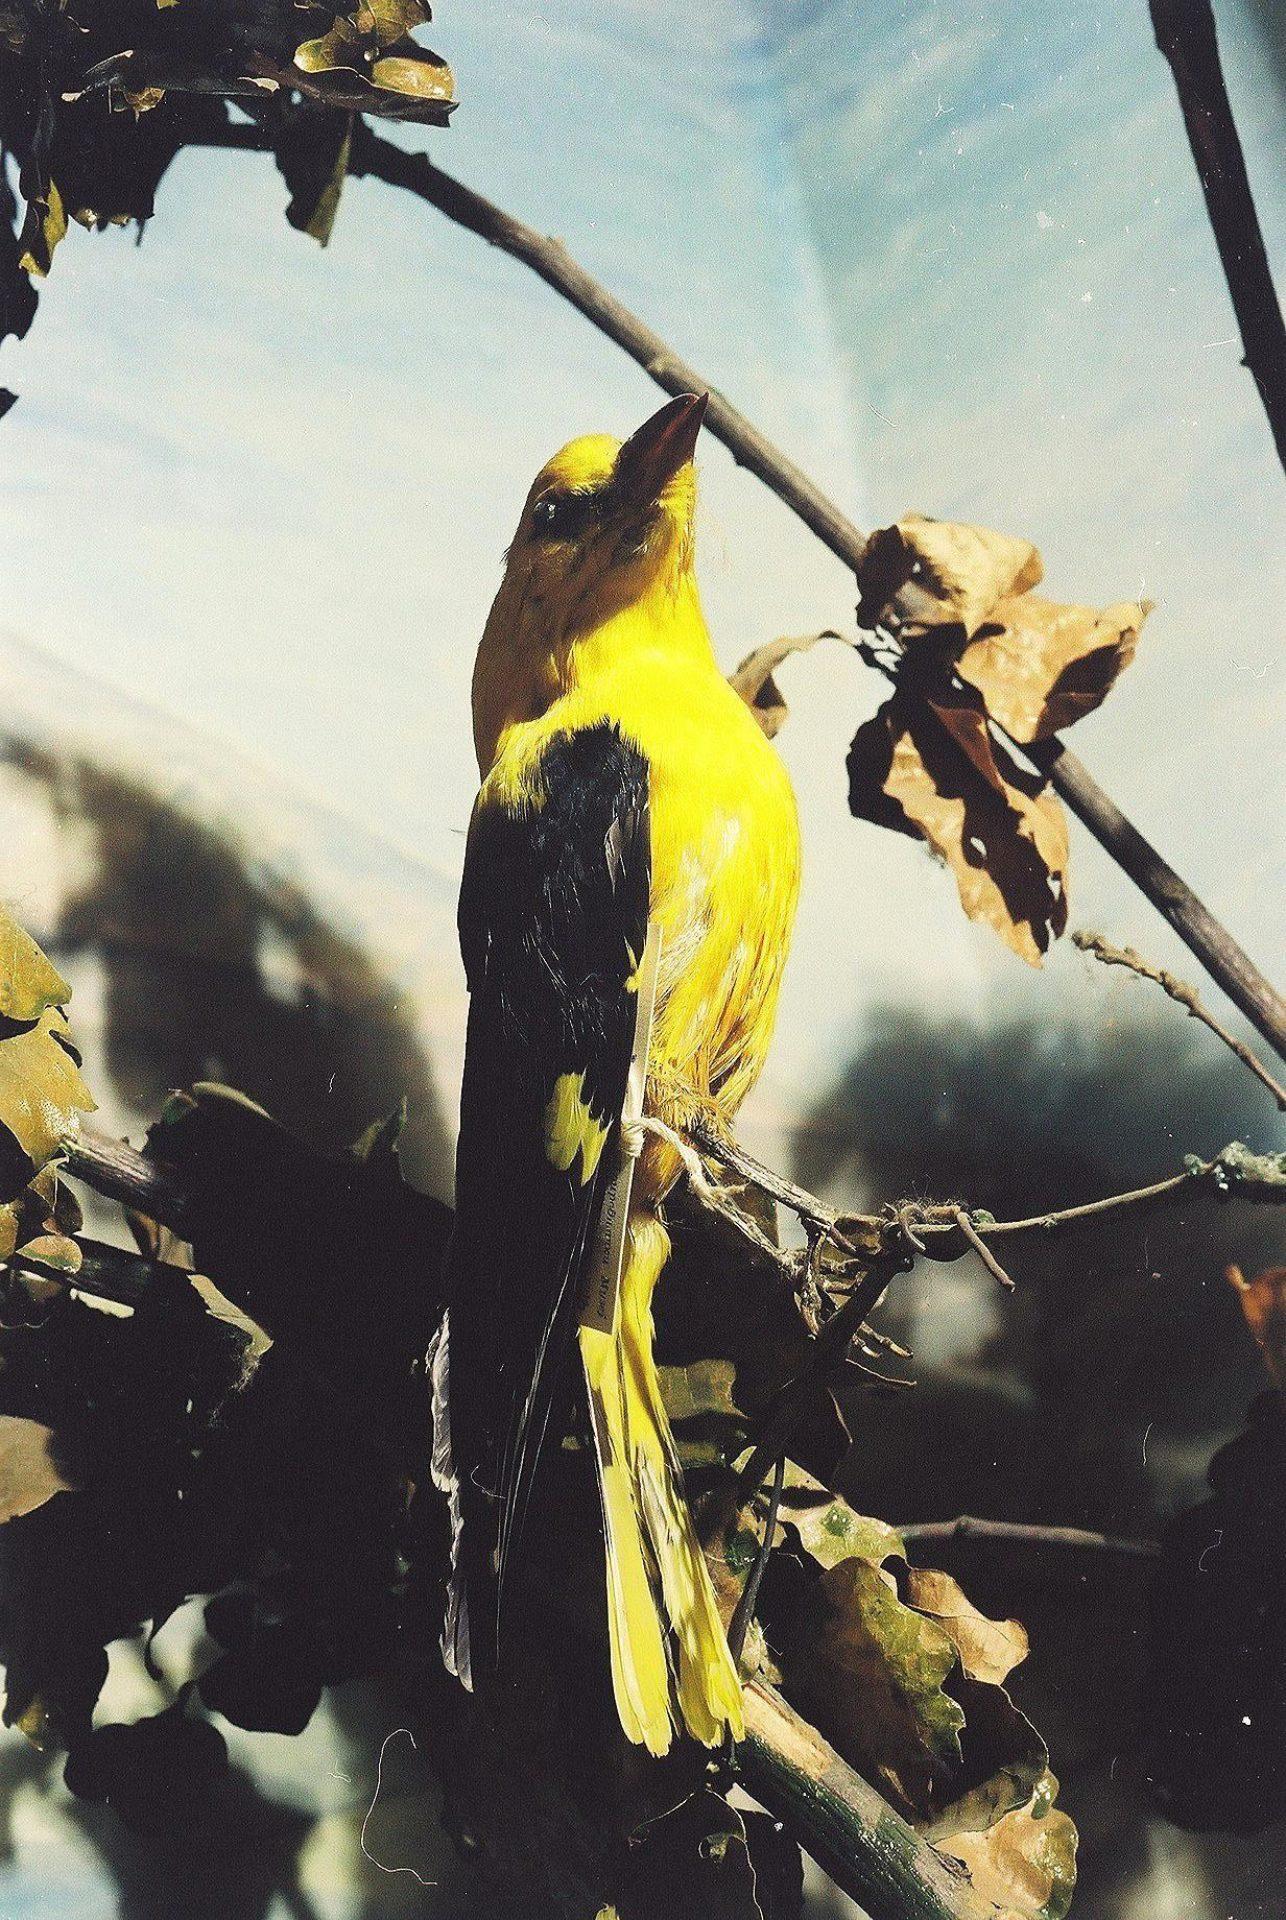 Petrit Halilaj, Special Edition (ex-Natural History Museum of Kosovo), 2013 (01/80)